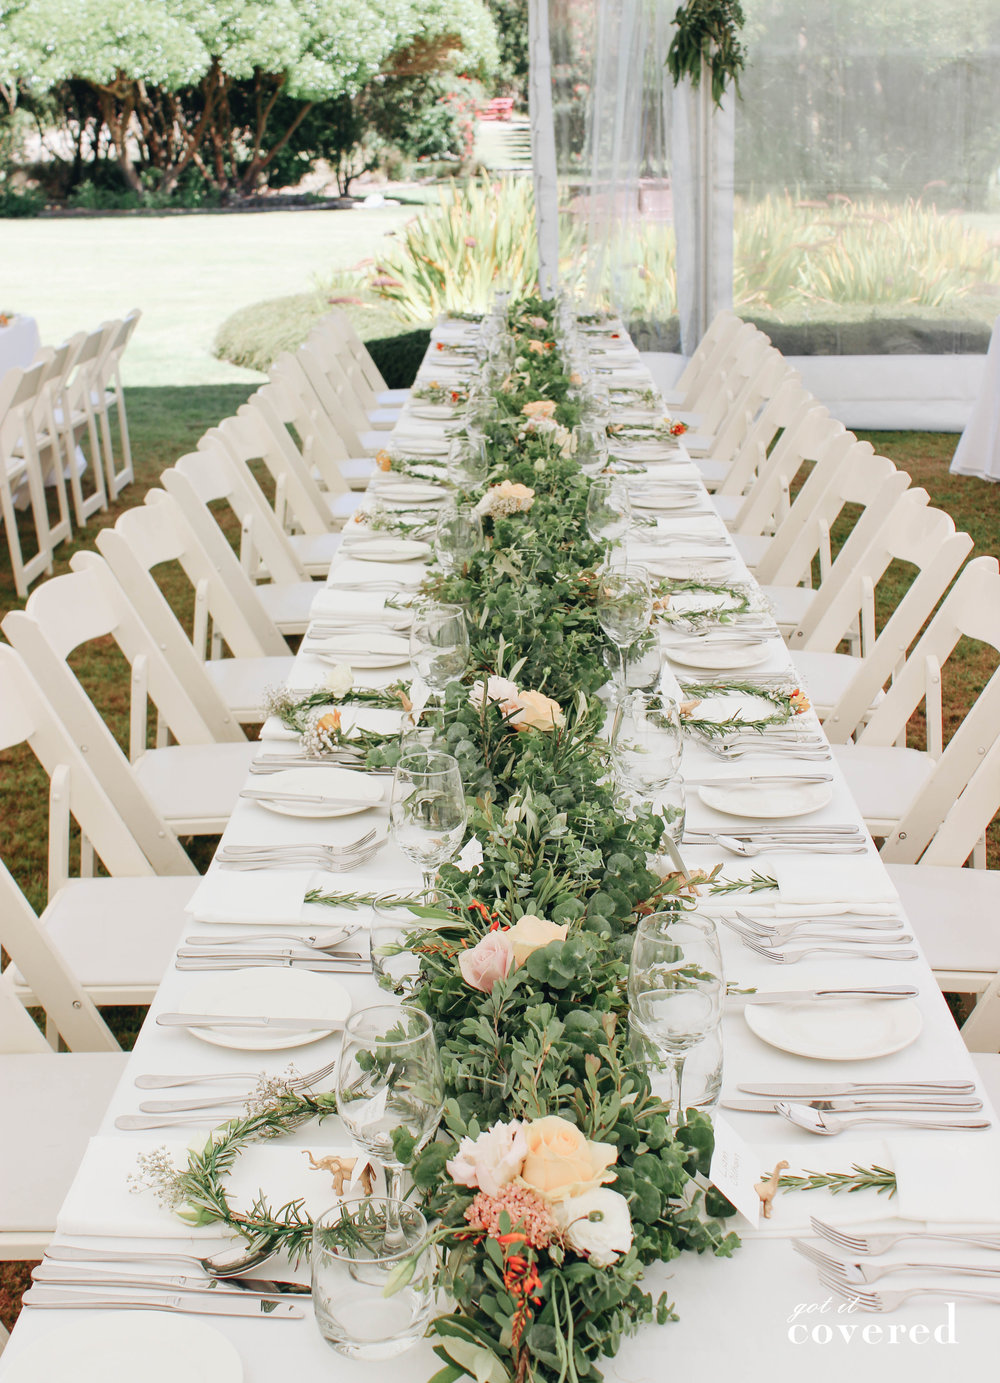 S&J wedding 17 18-1.jpg